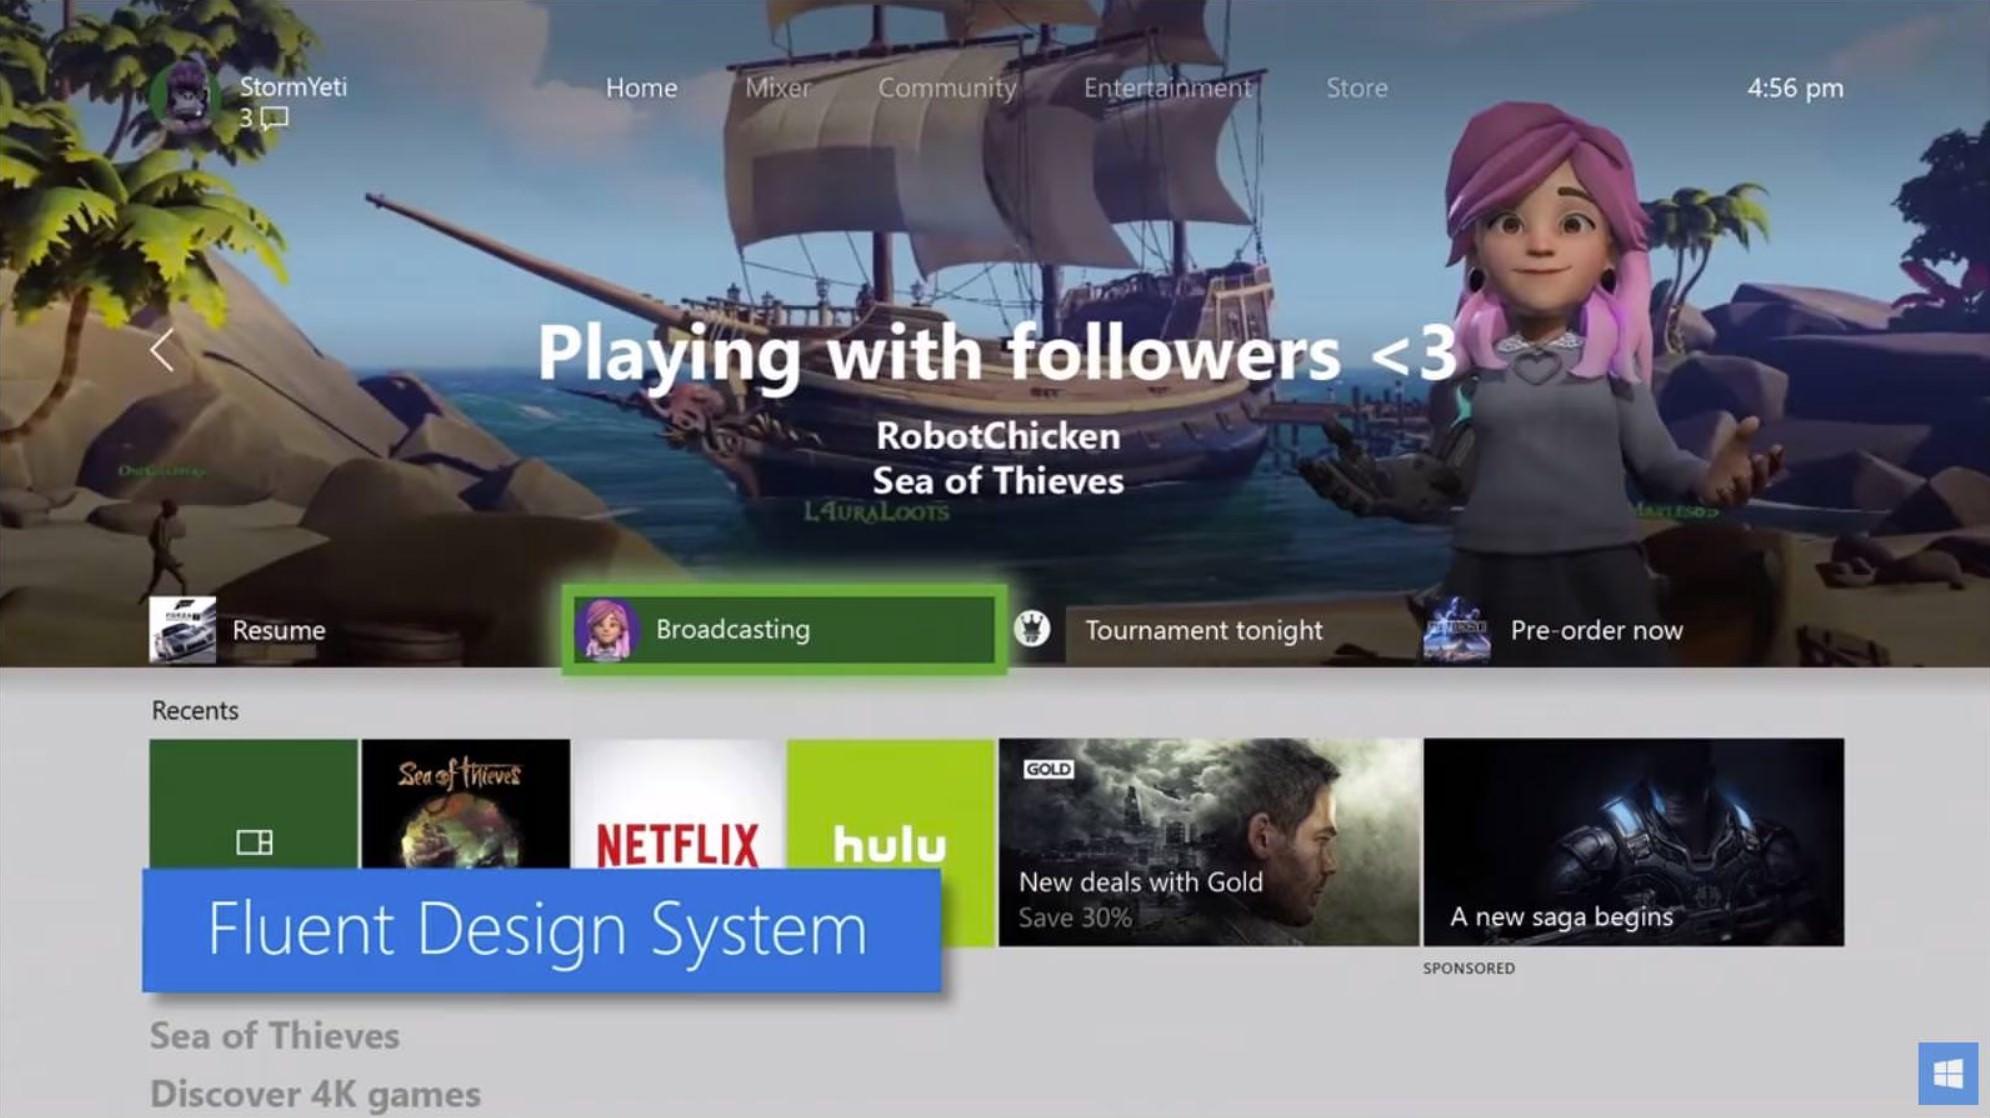 Microsoft's diverse new Xbox Live avatars will launch in April